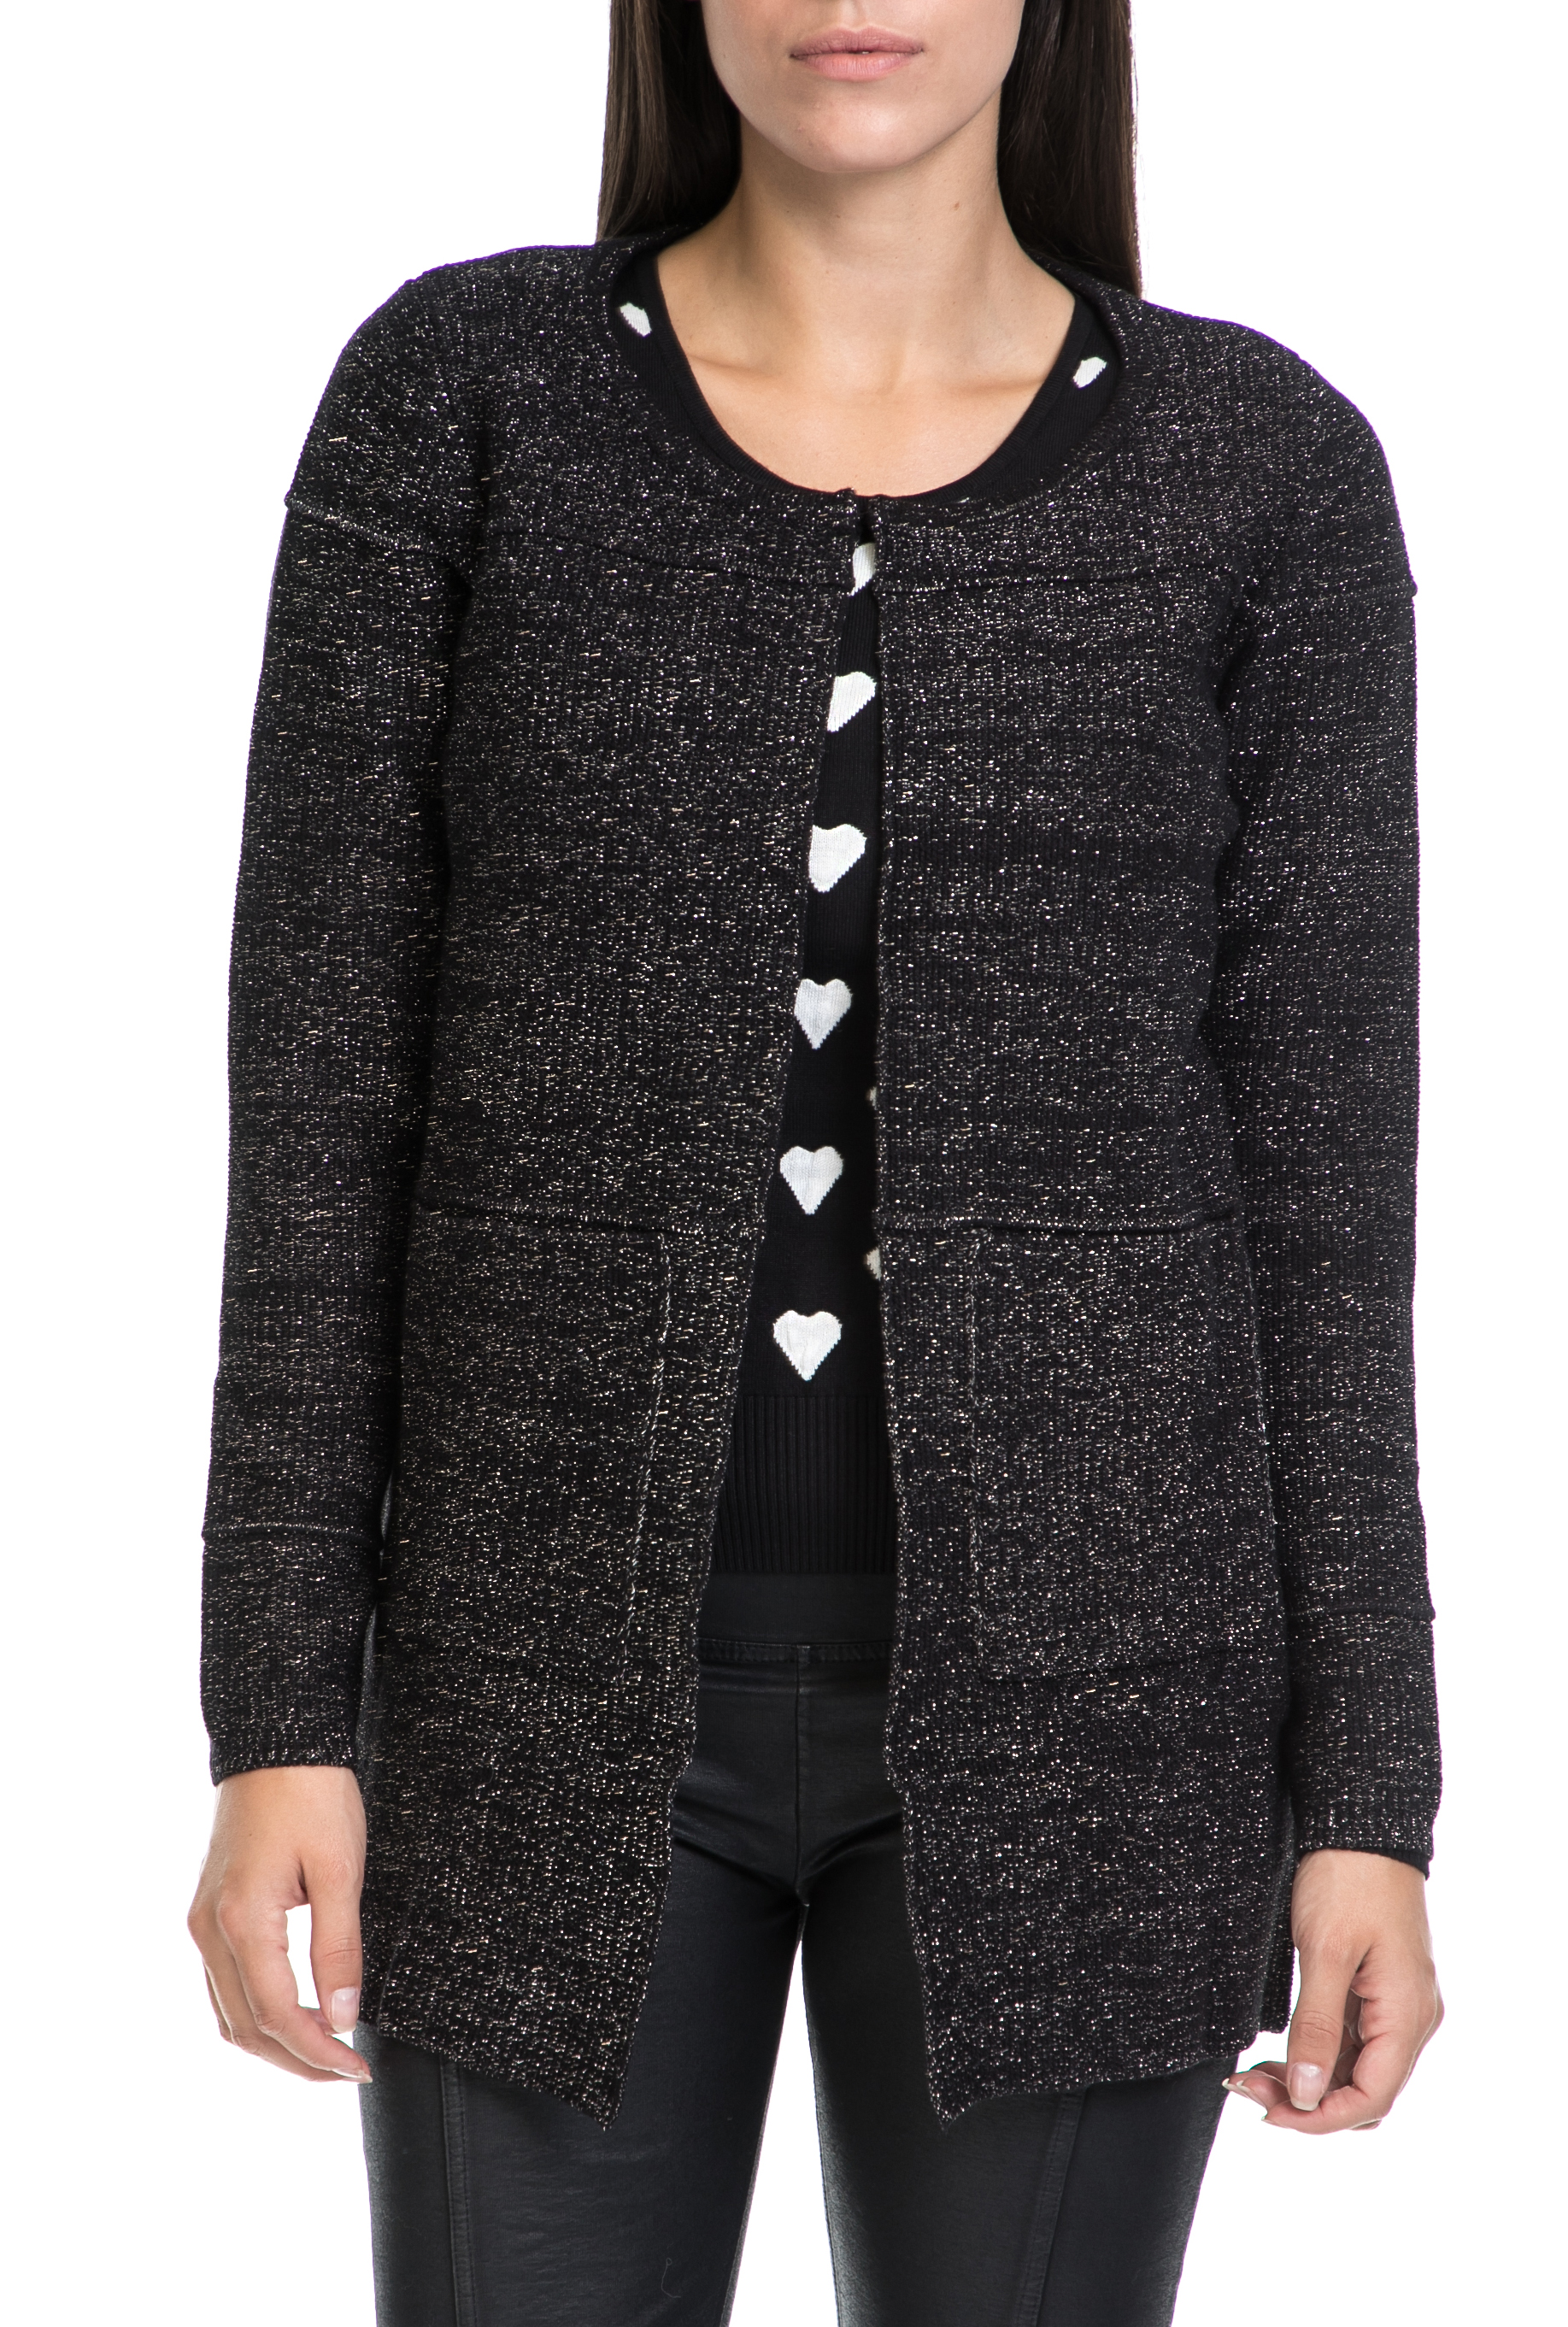 MOLLY BRACKEN - Γυναικεία ζακέτα MOLLY BRACKEN μαύρη-ασημί γυναικεία ρούχα πλεκτά ζακέτες